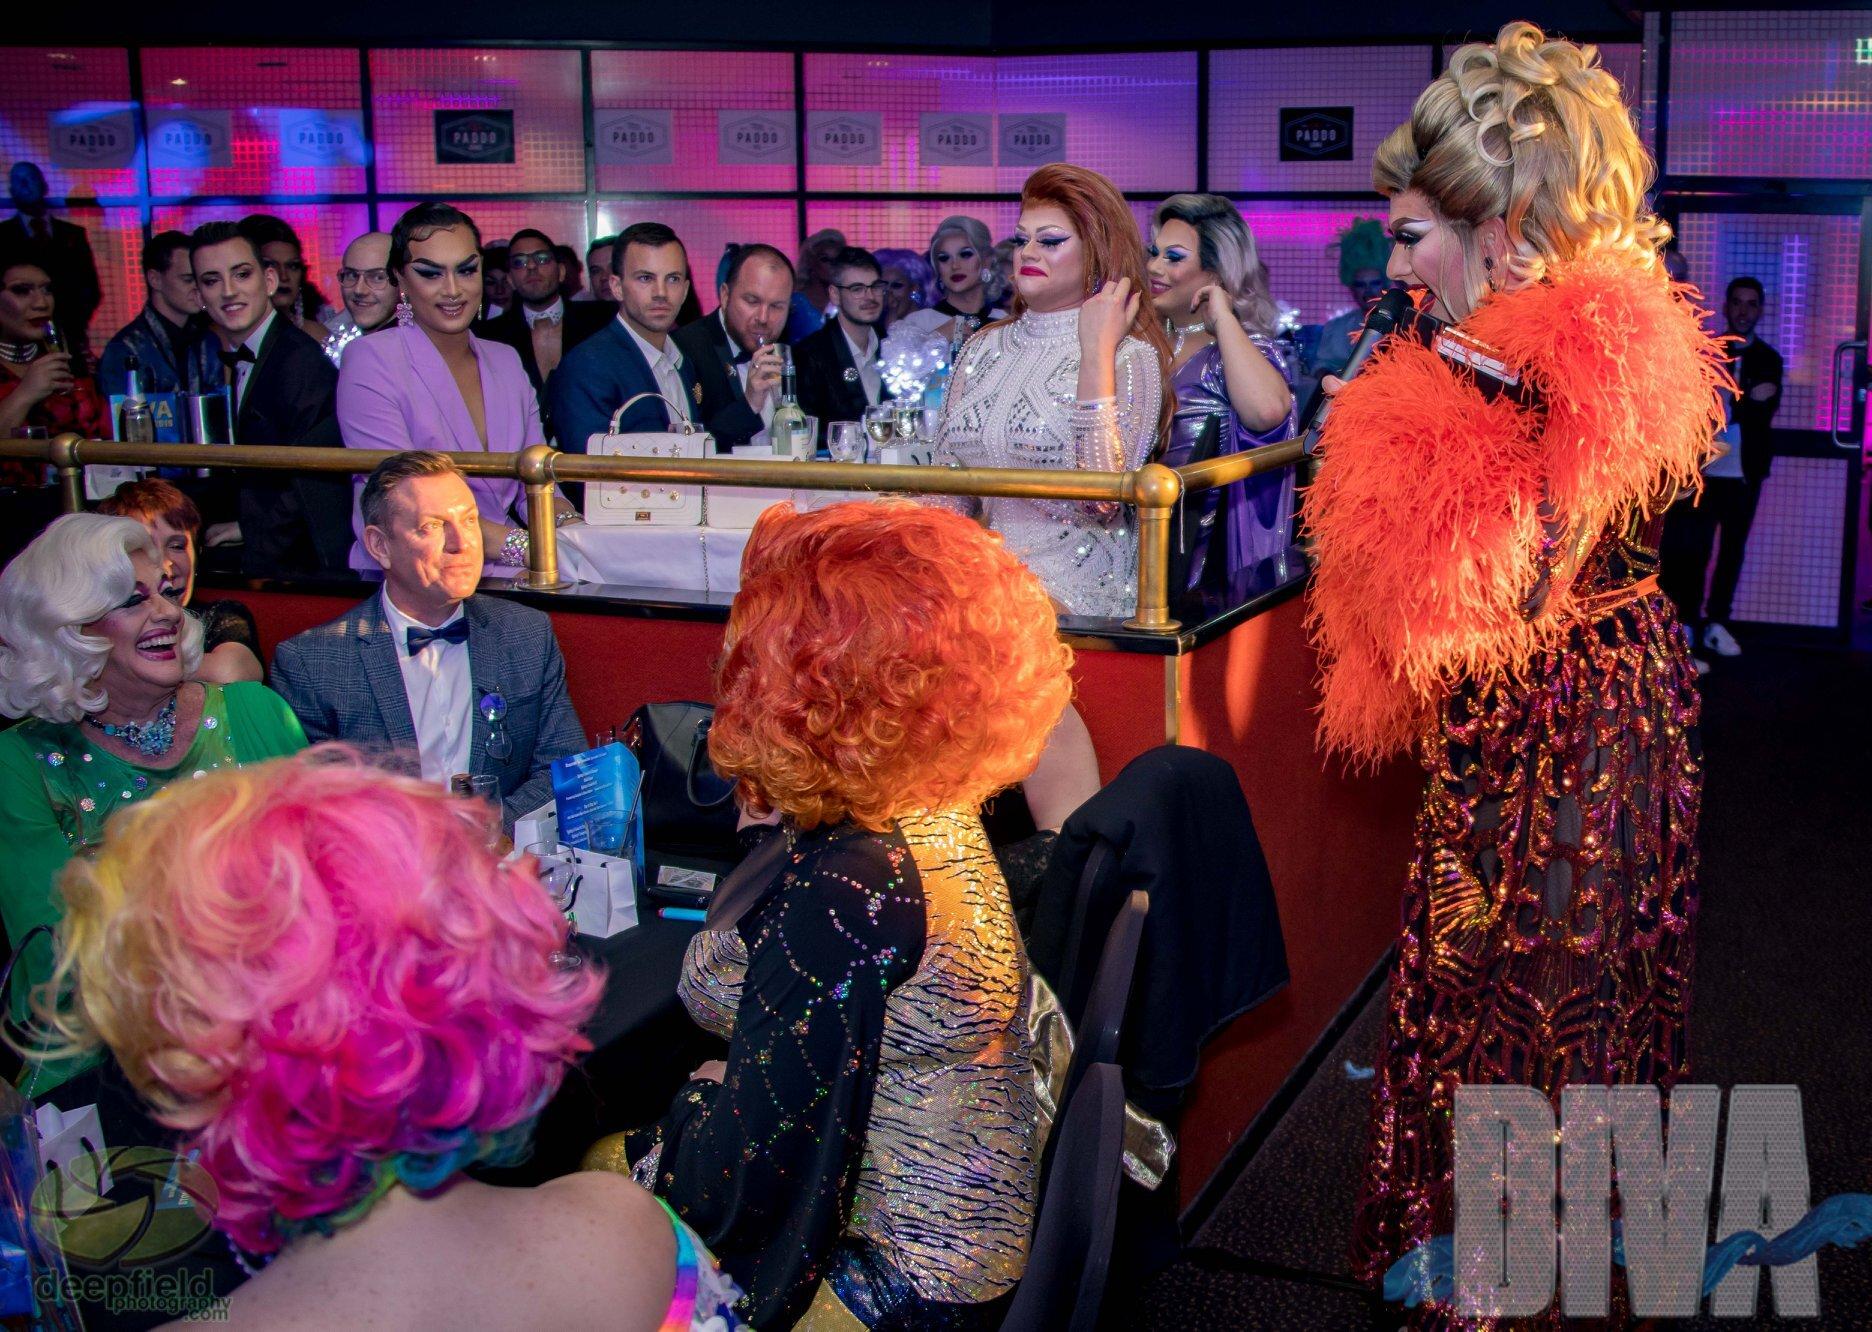 charisma-belle-corporate-host-event-hosting-diva-awards-sydney-drag-queen-royalty-best-hire-drag-race-australia-1.jpg